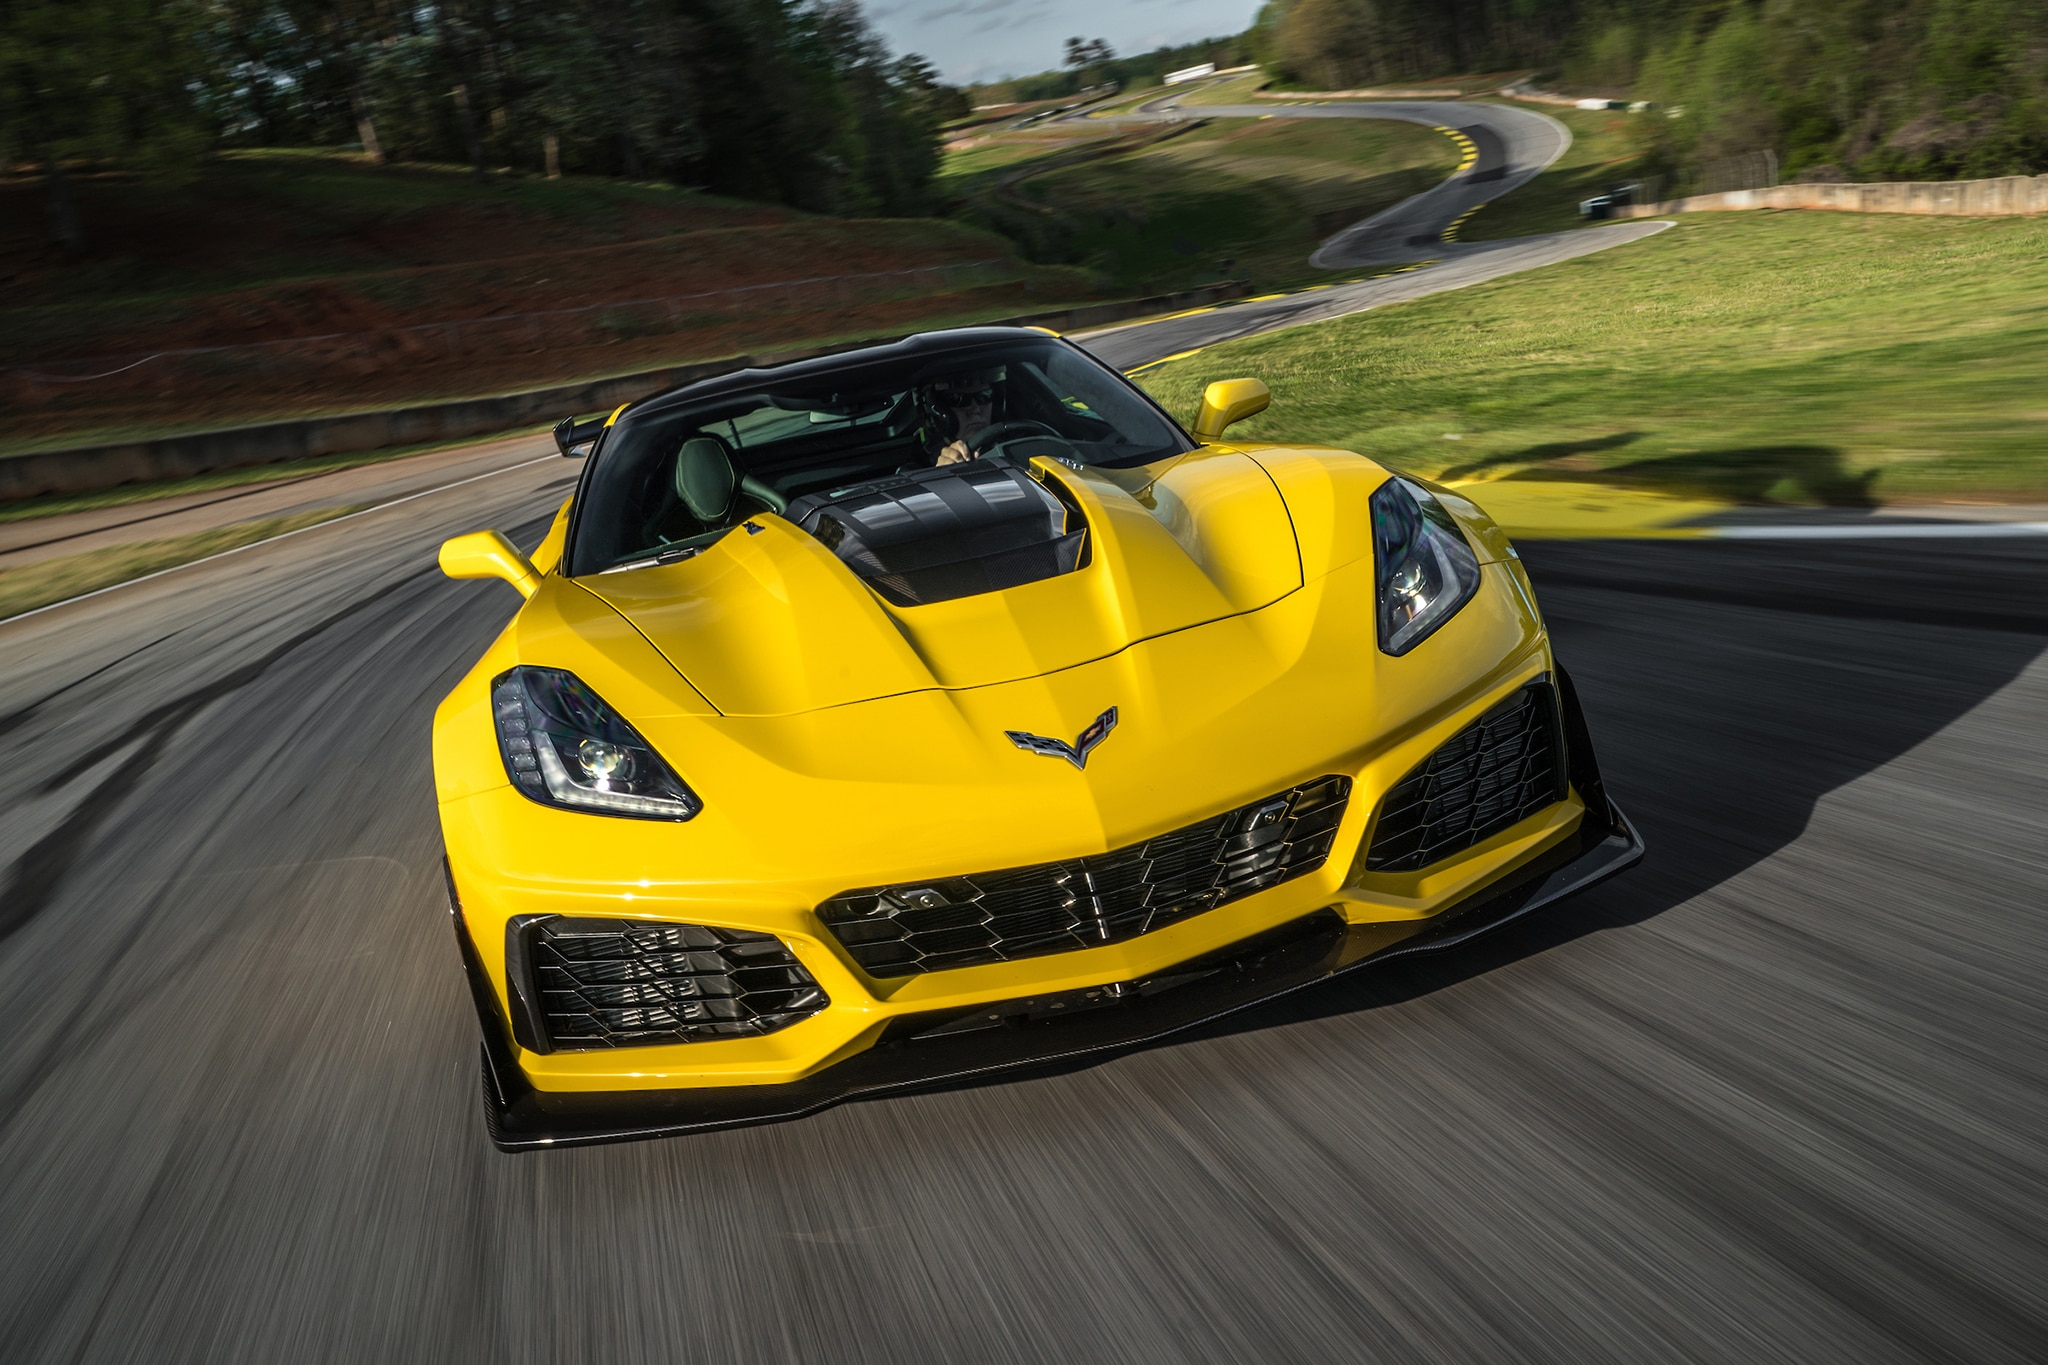 4 Door Corvette >> 2019 Chevrolet Corvette ZR1 First Drive | Automobile Magazine